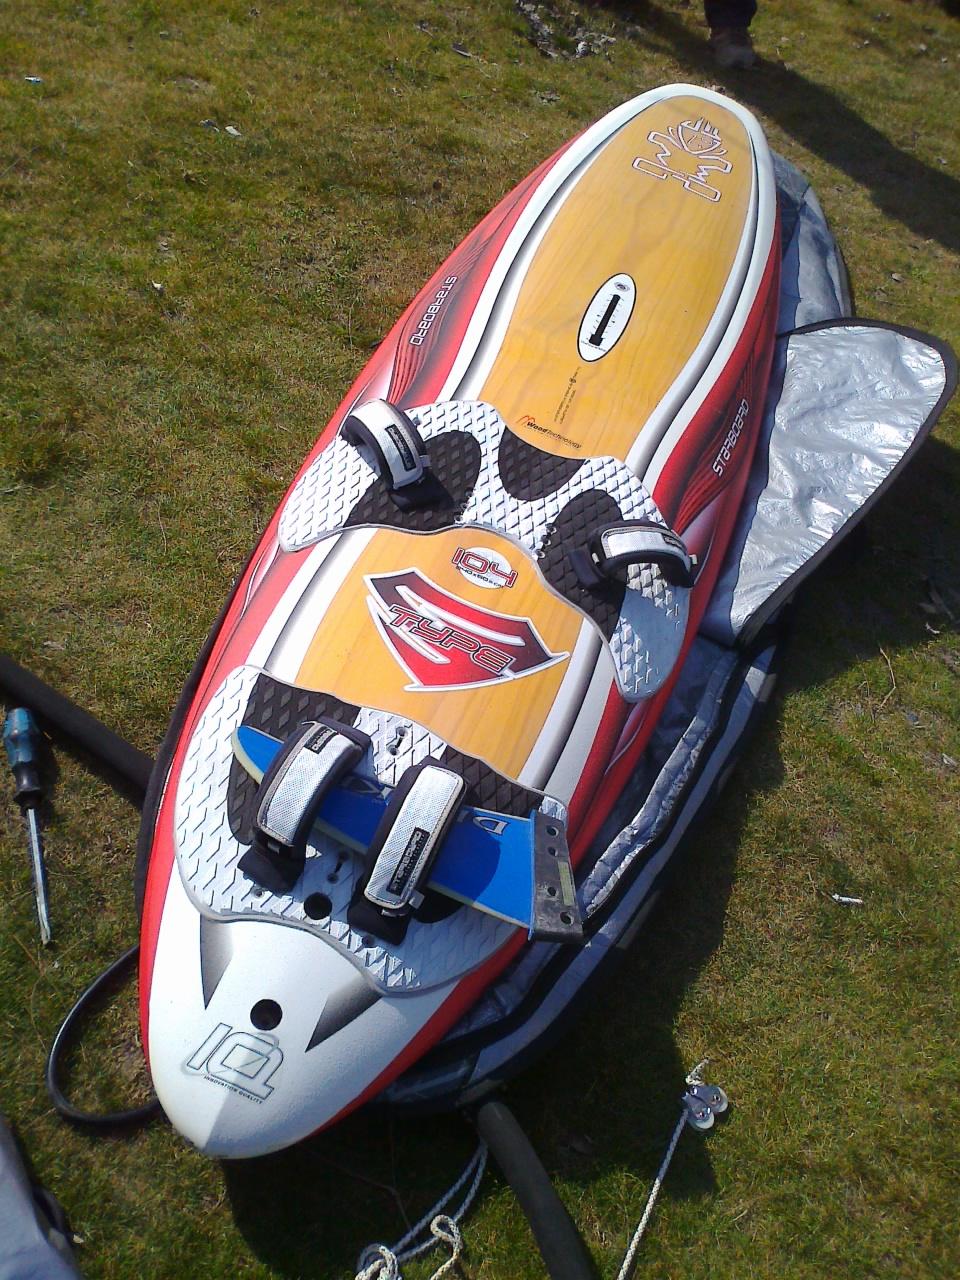 Windsurf starboard s type 104lt e drops stubby 110lt surfmercato - Tavole da windsurf usate ...